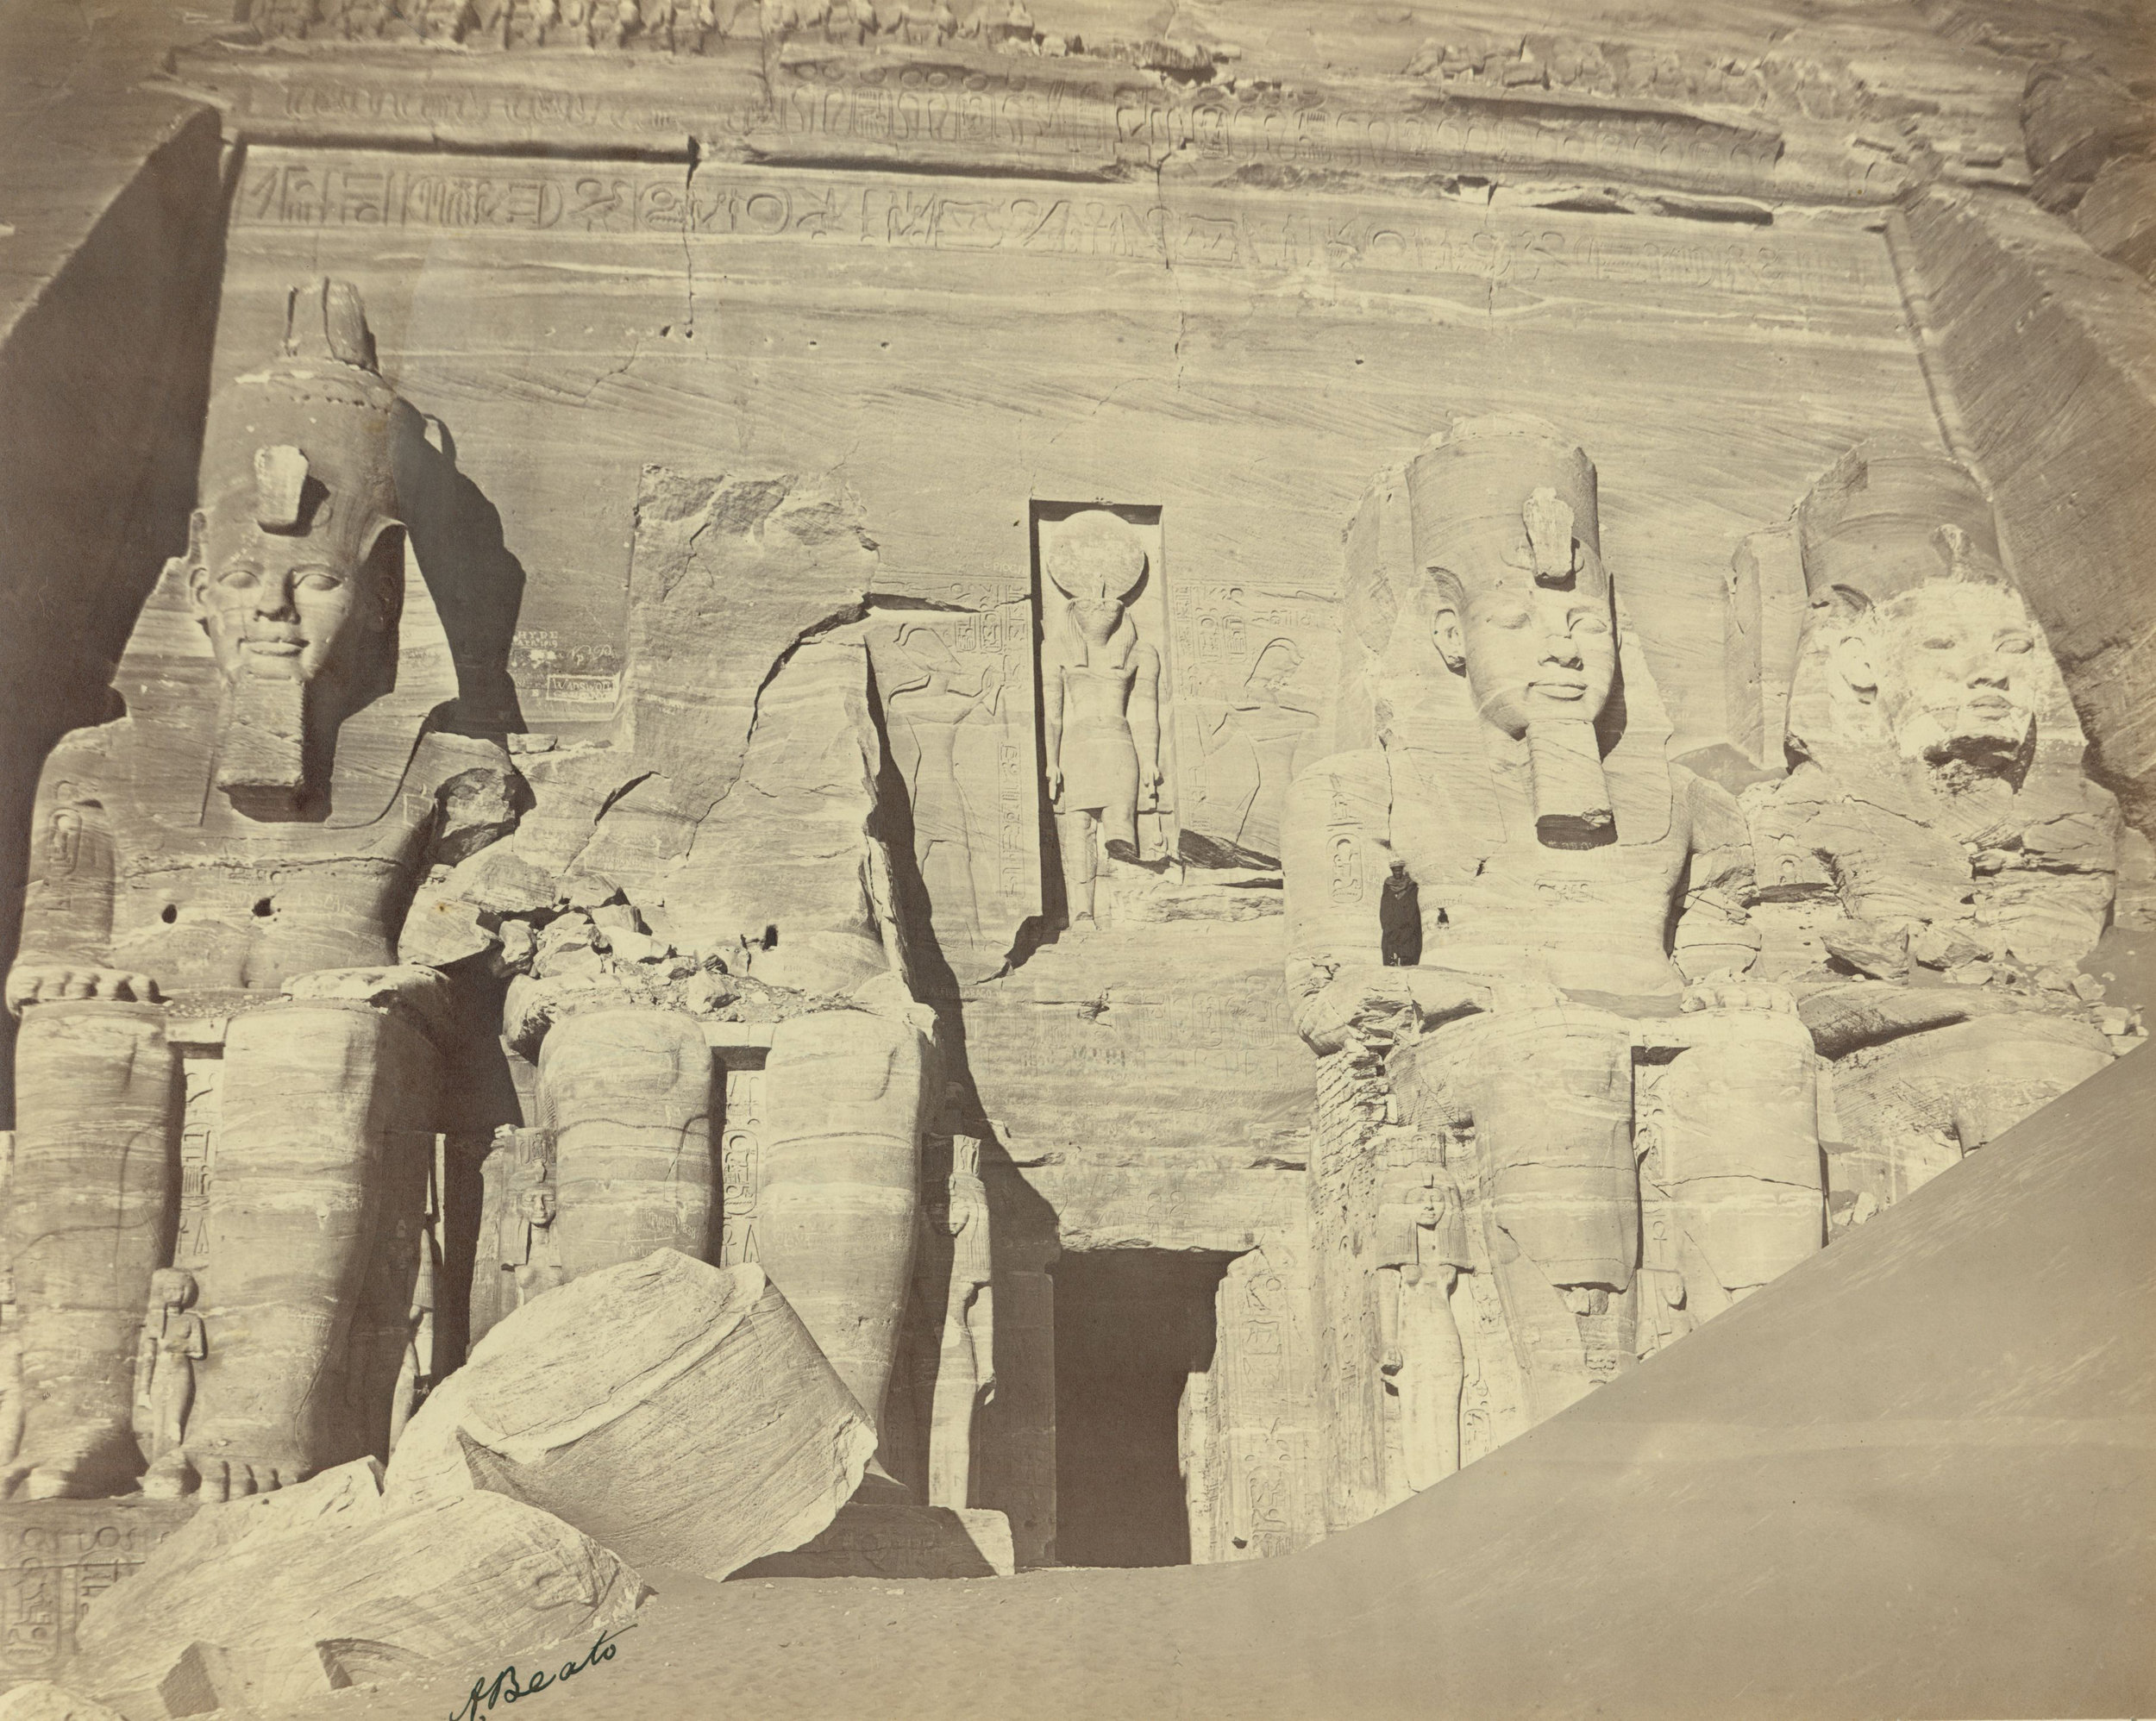 ANTONIO BEATO Abu Simbel, Egypt (Façade) c. 1887